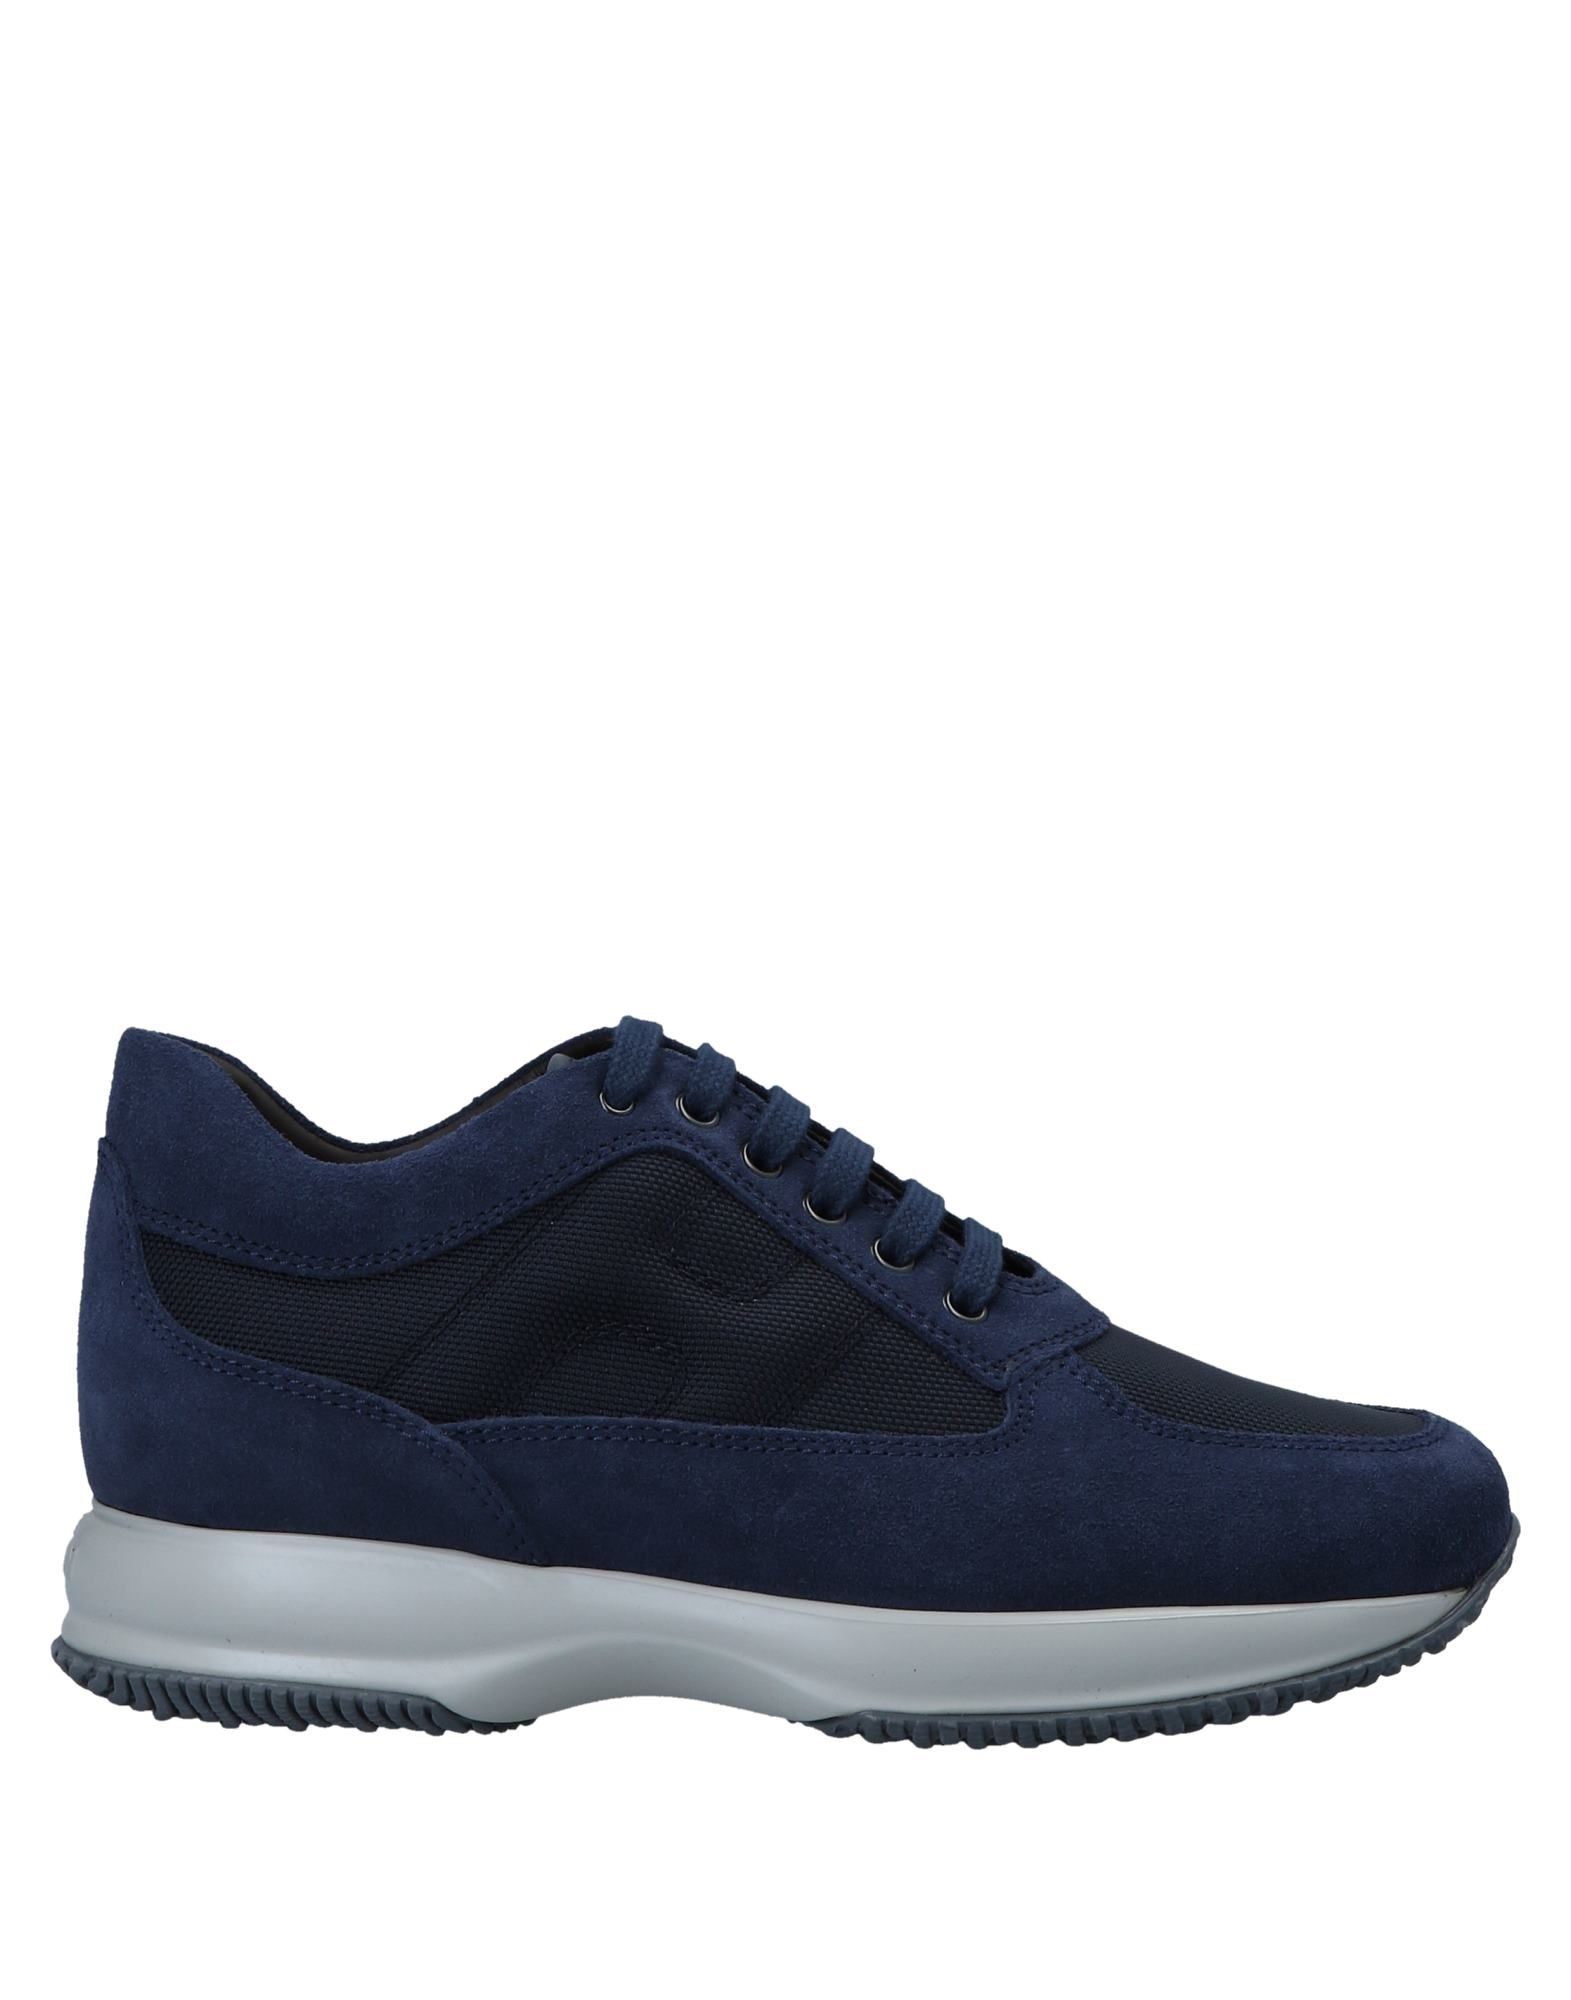 Hogan Gute Sneakers Herren  11325573FN Gute Hogan Qualität beliebte Schuhe 4f052f